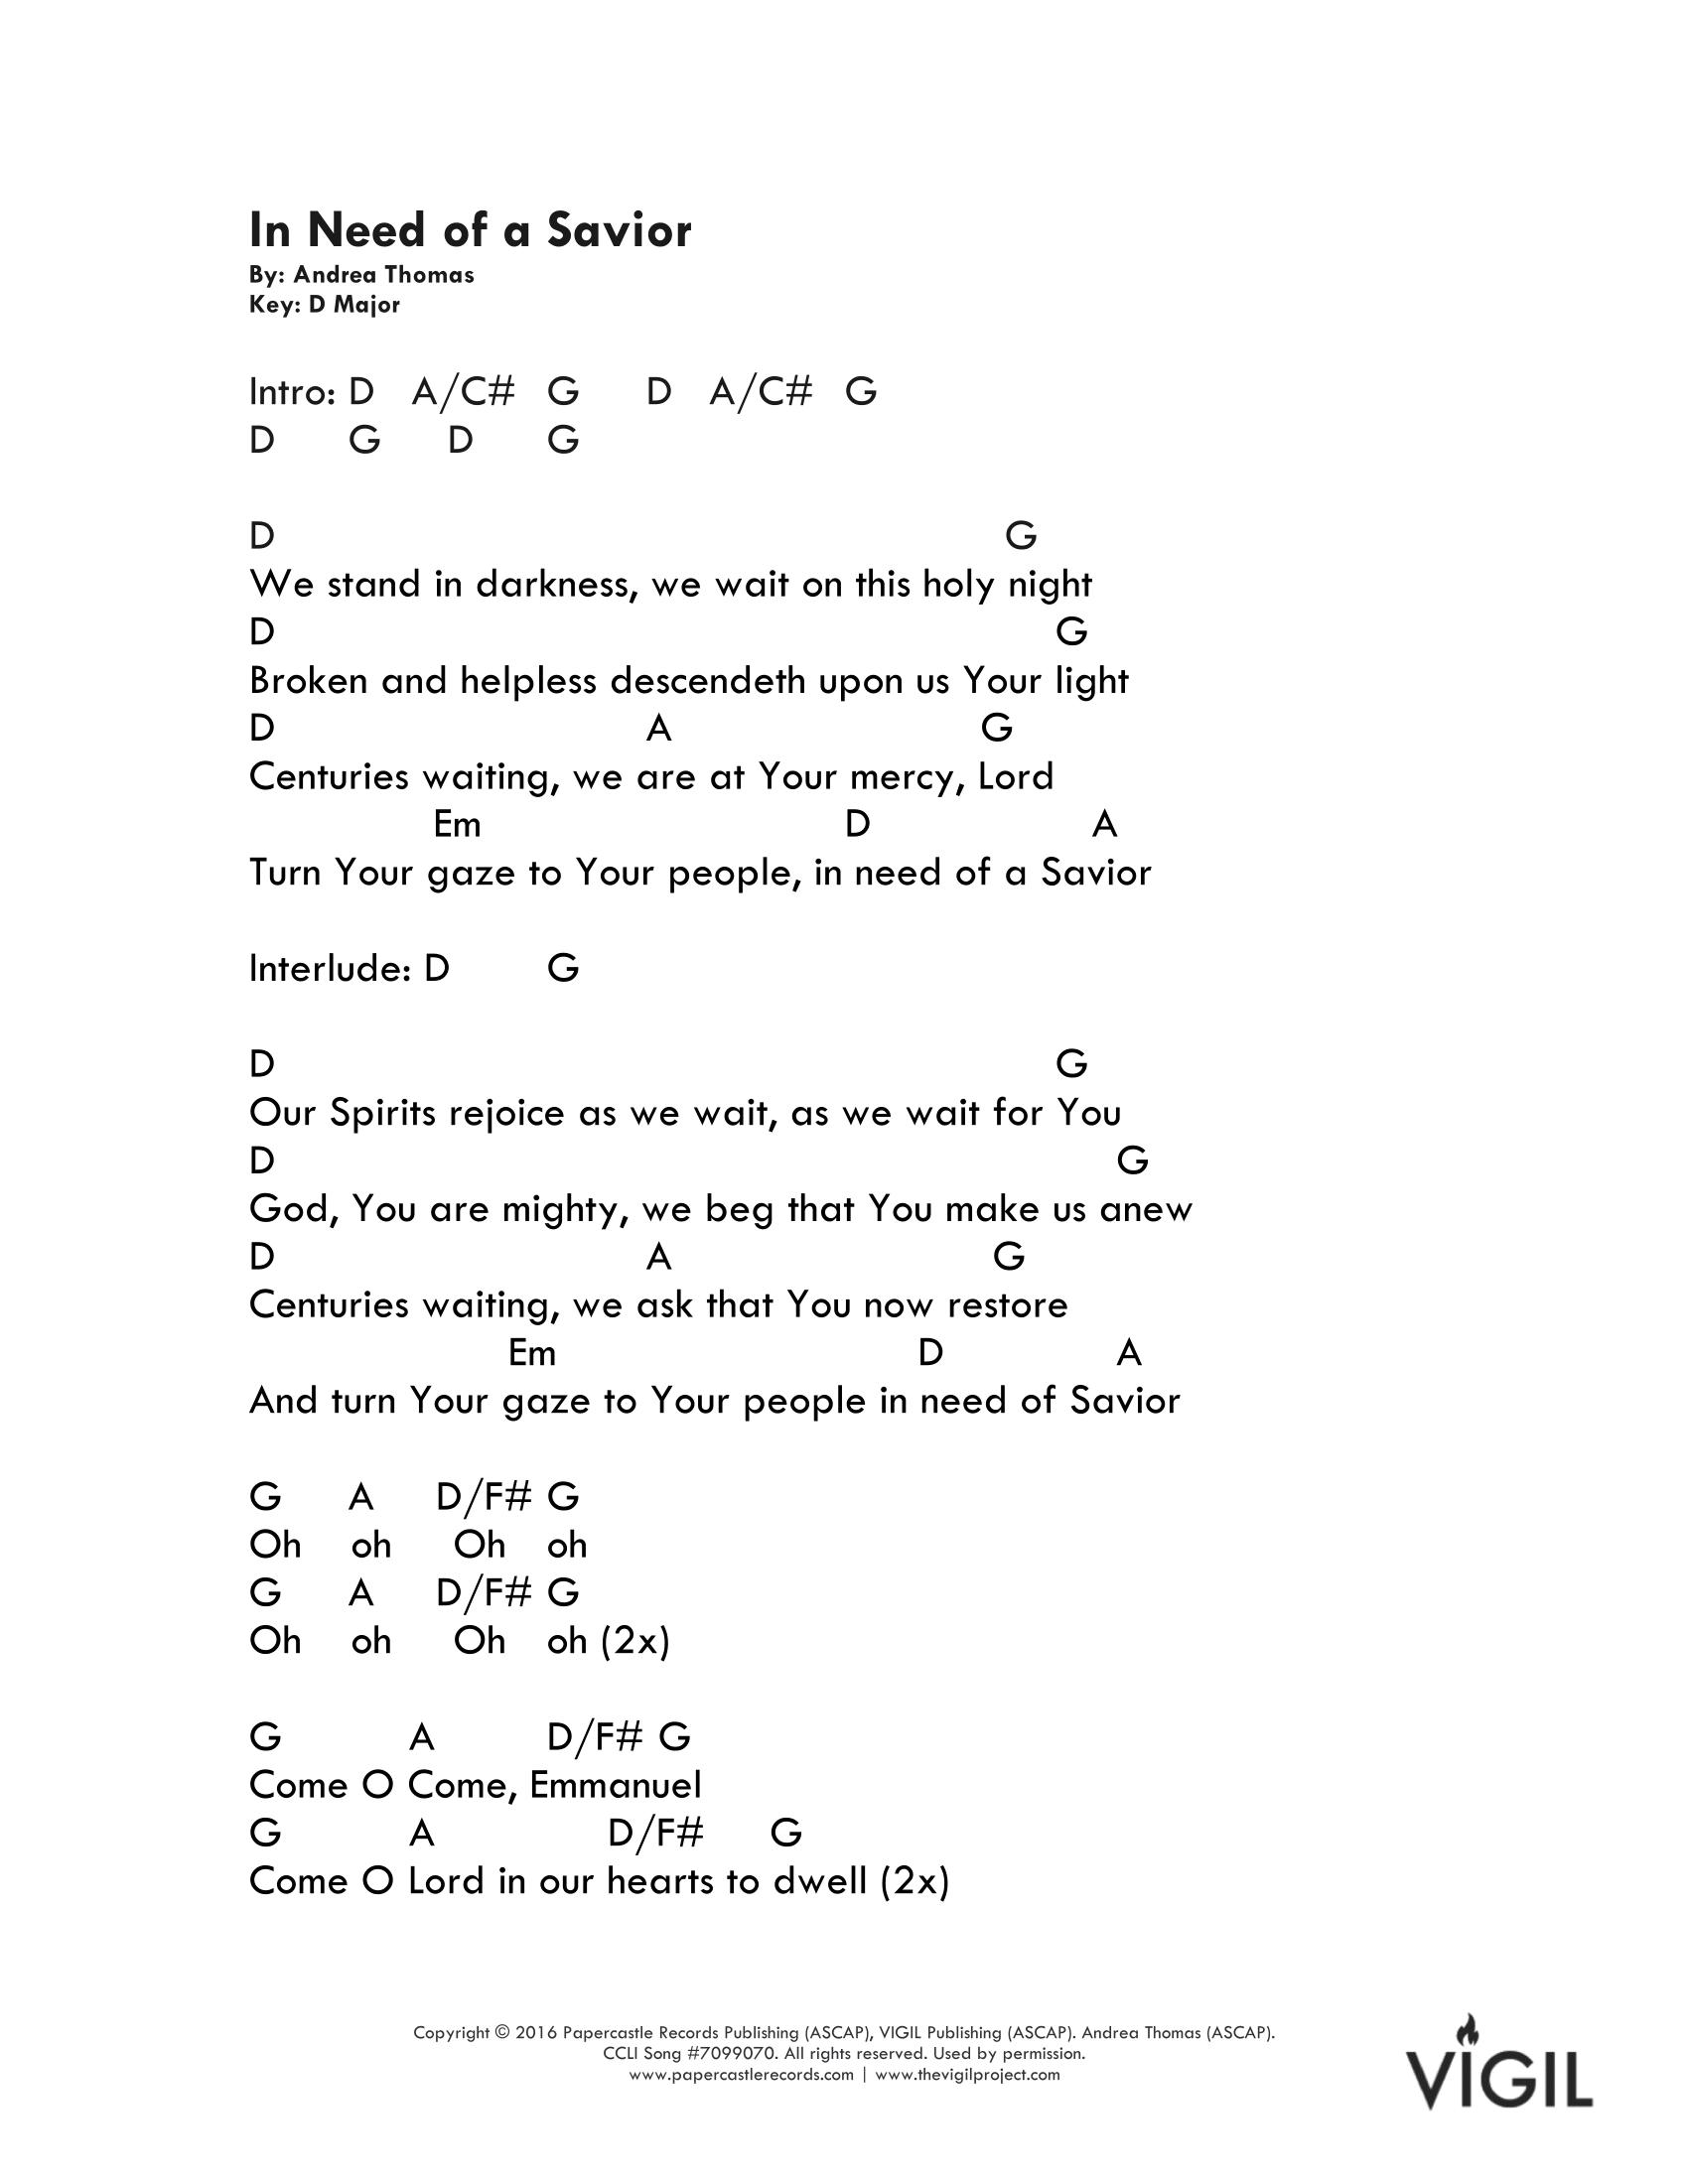 VIGIL S2 - In Need of a Savior (D Major)-1.png